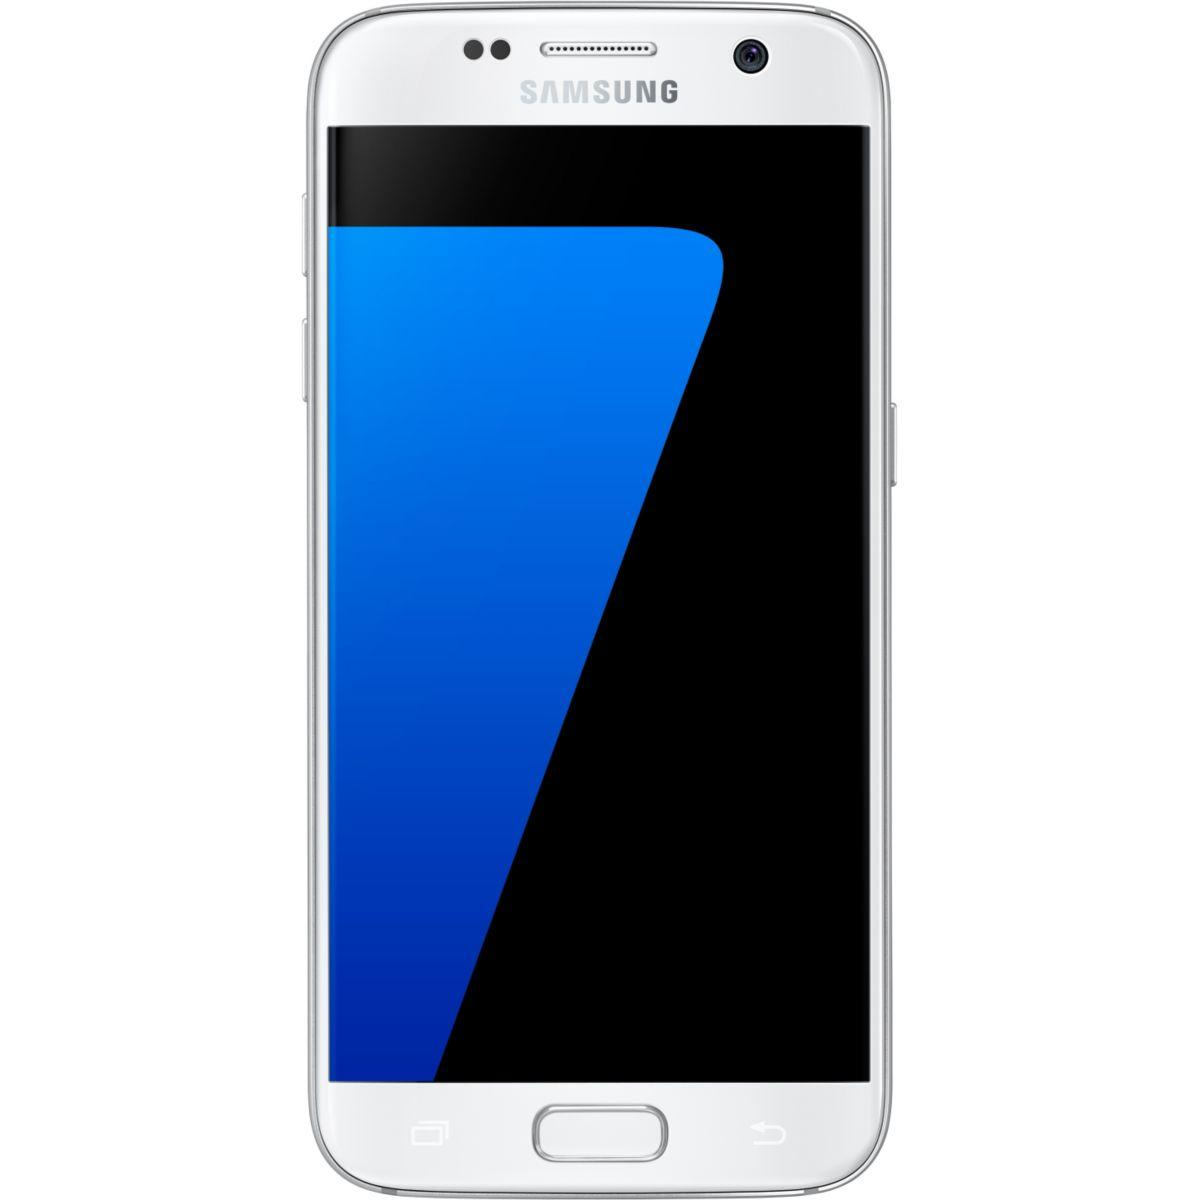 Pack promo smartphone samsung galaxy s7 32go blanc + etui samsung view cover led galaxy s7 silver - soldes et bonnes affaires à prix imbattables